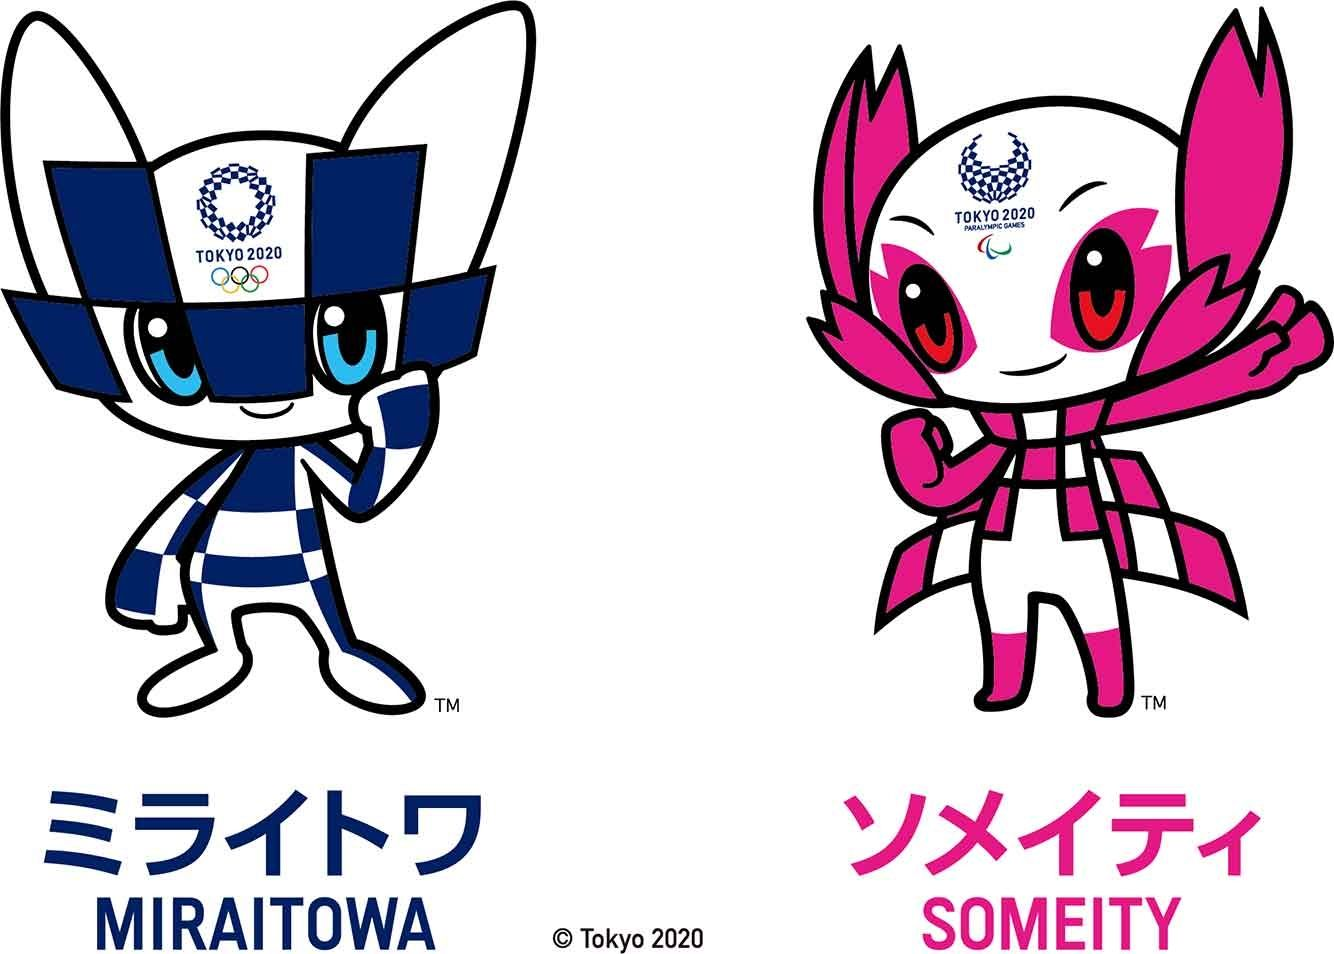 Tokyo 2020 Mascots, MIRAITOWA and SOMEITY have finally ...